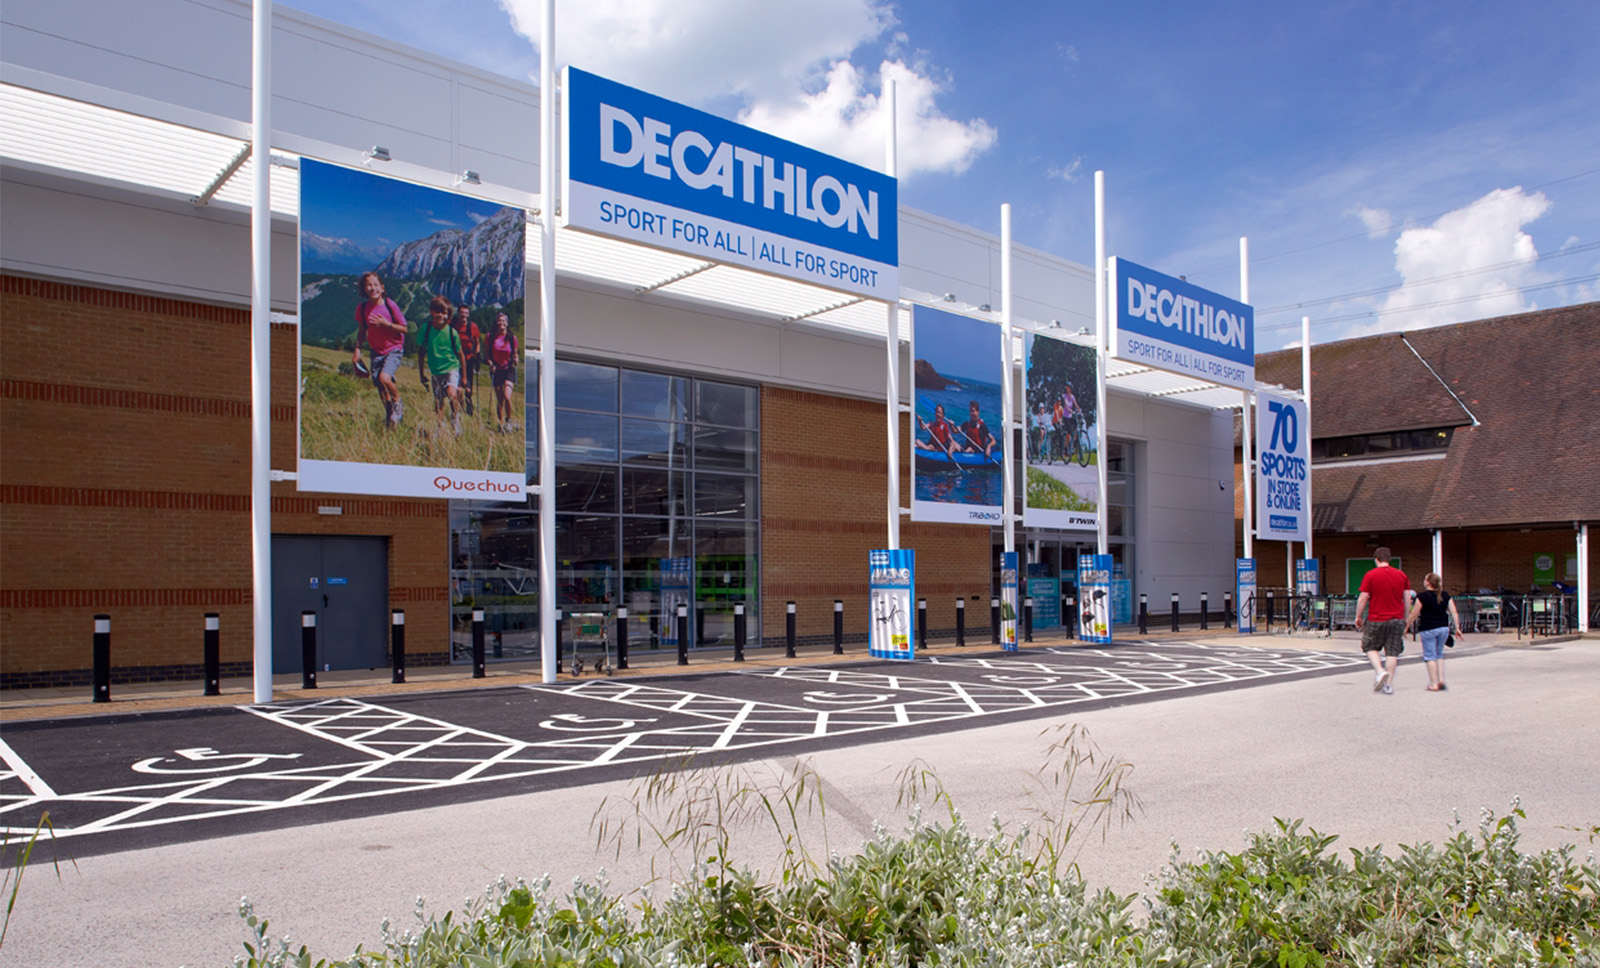 Decathlon store entrance